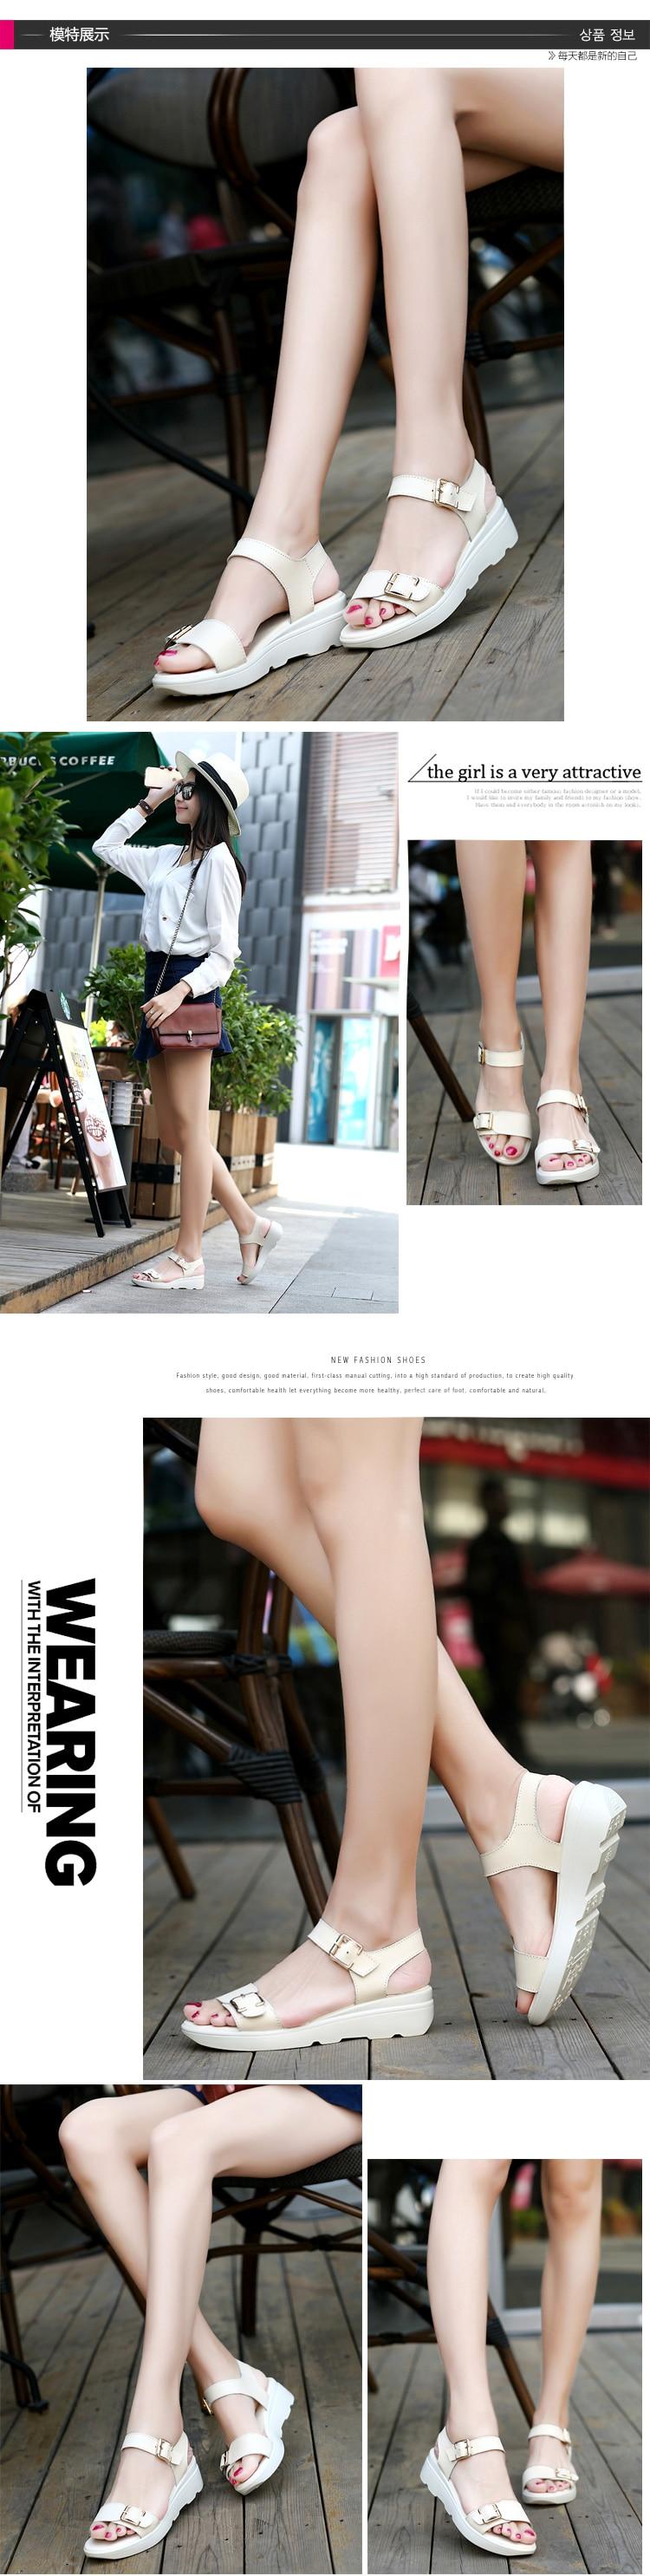 ULKN women Open Toe Platform Sandals women casual shoes Nwomen sandals PU Leather flat Sandals Low Wedges Summer Shoes 10